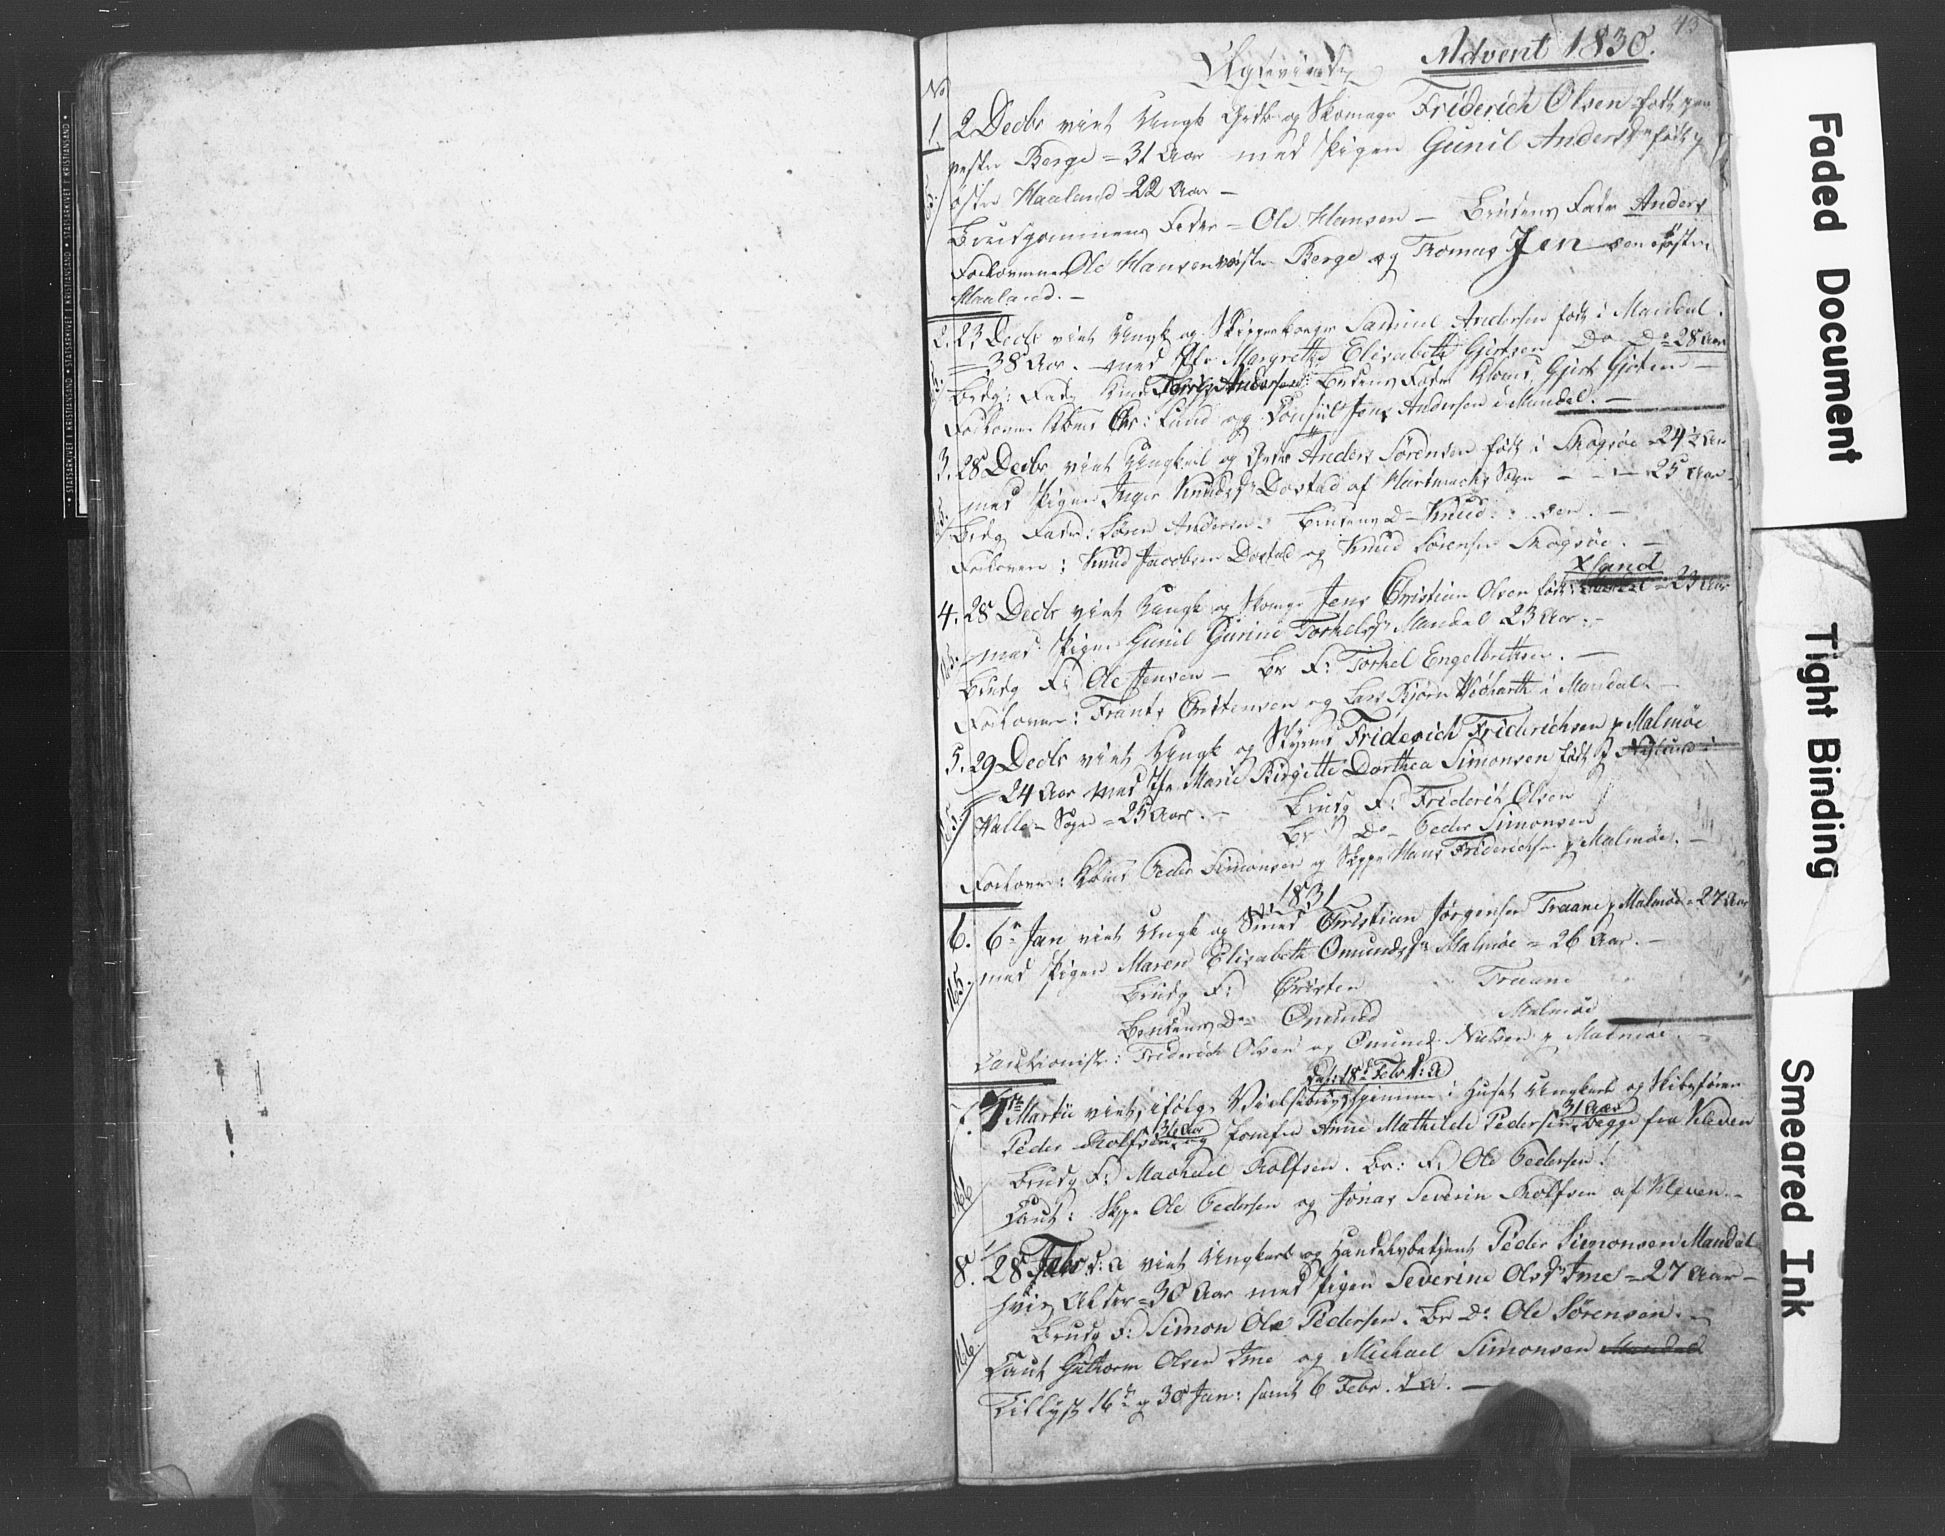 SAK, Mandal sokneprestkontor, F/Fb/Fba/L0003: Klokkerbok nr. B 1B, 1831-1834, s. 43